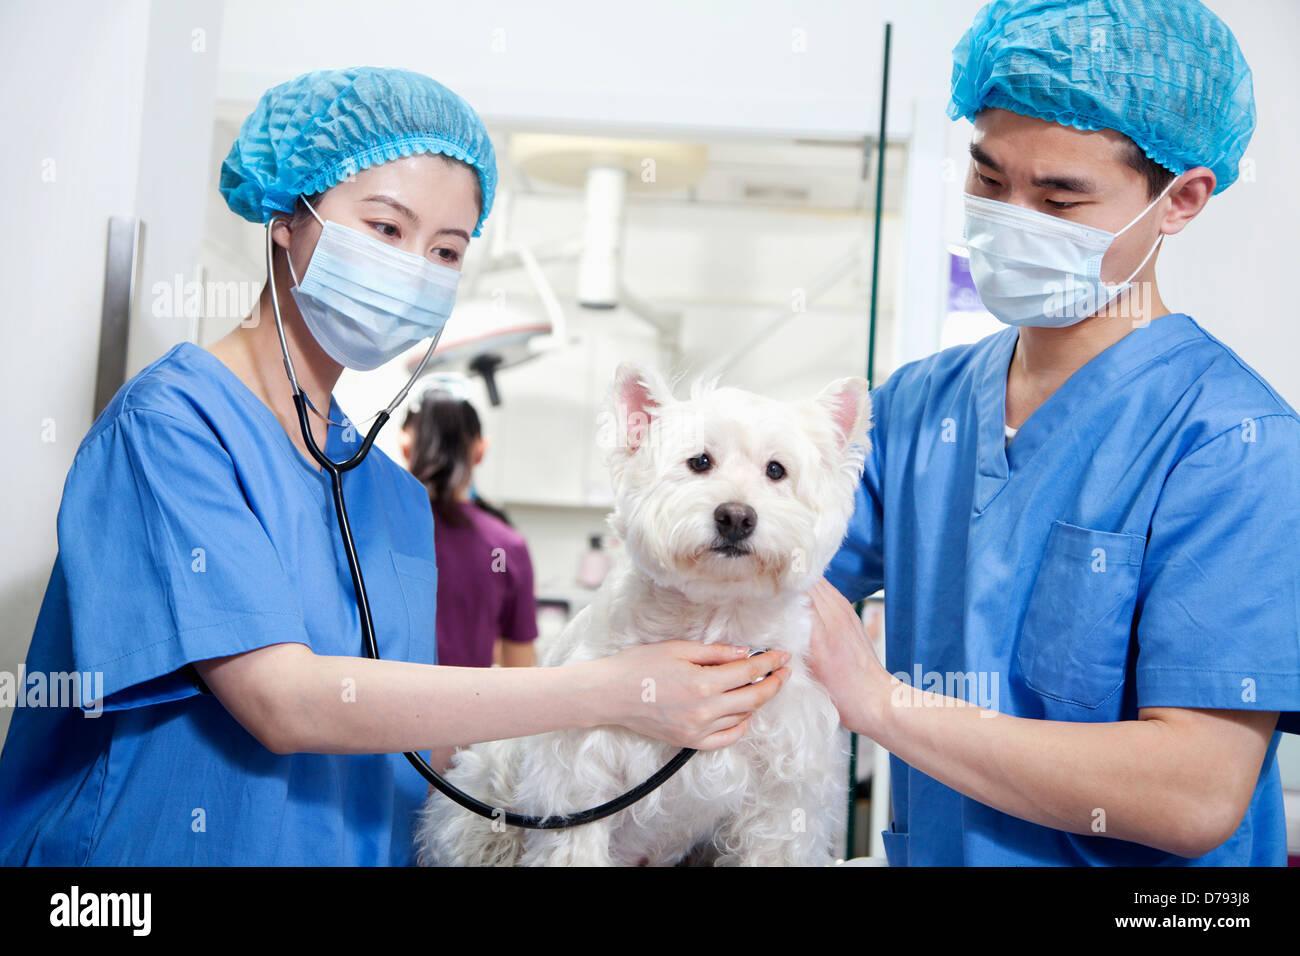 Veterinarians examining dog - Stock Image